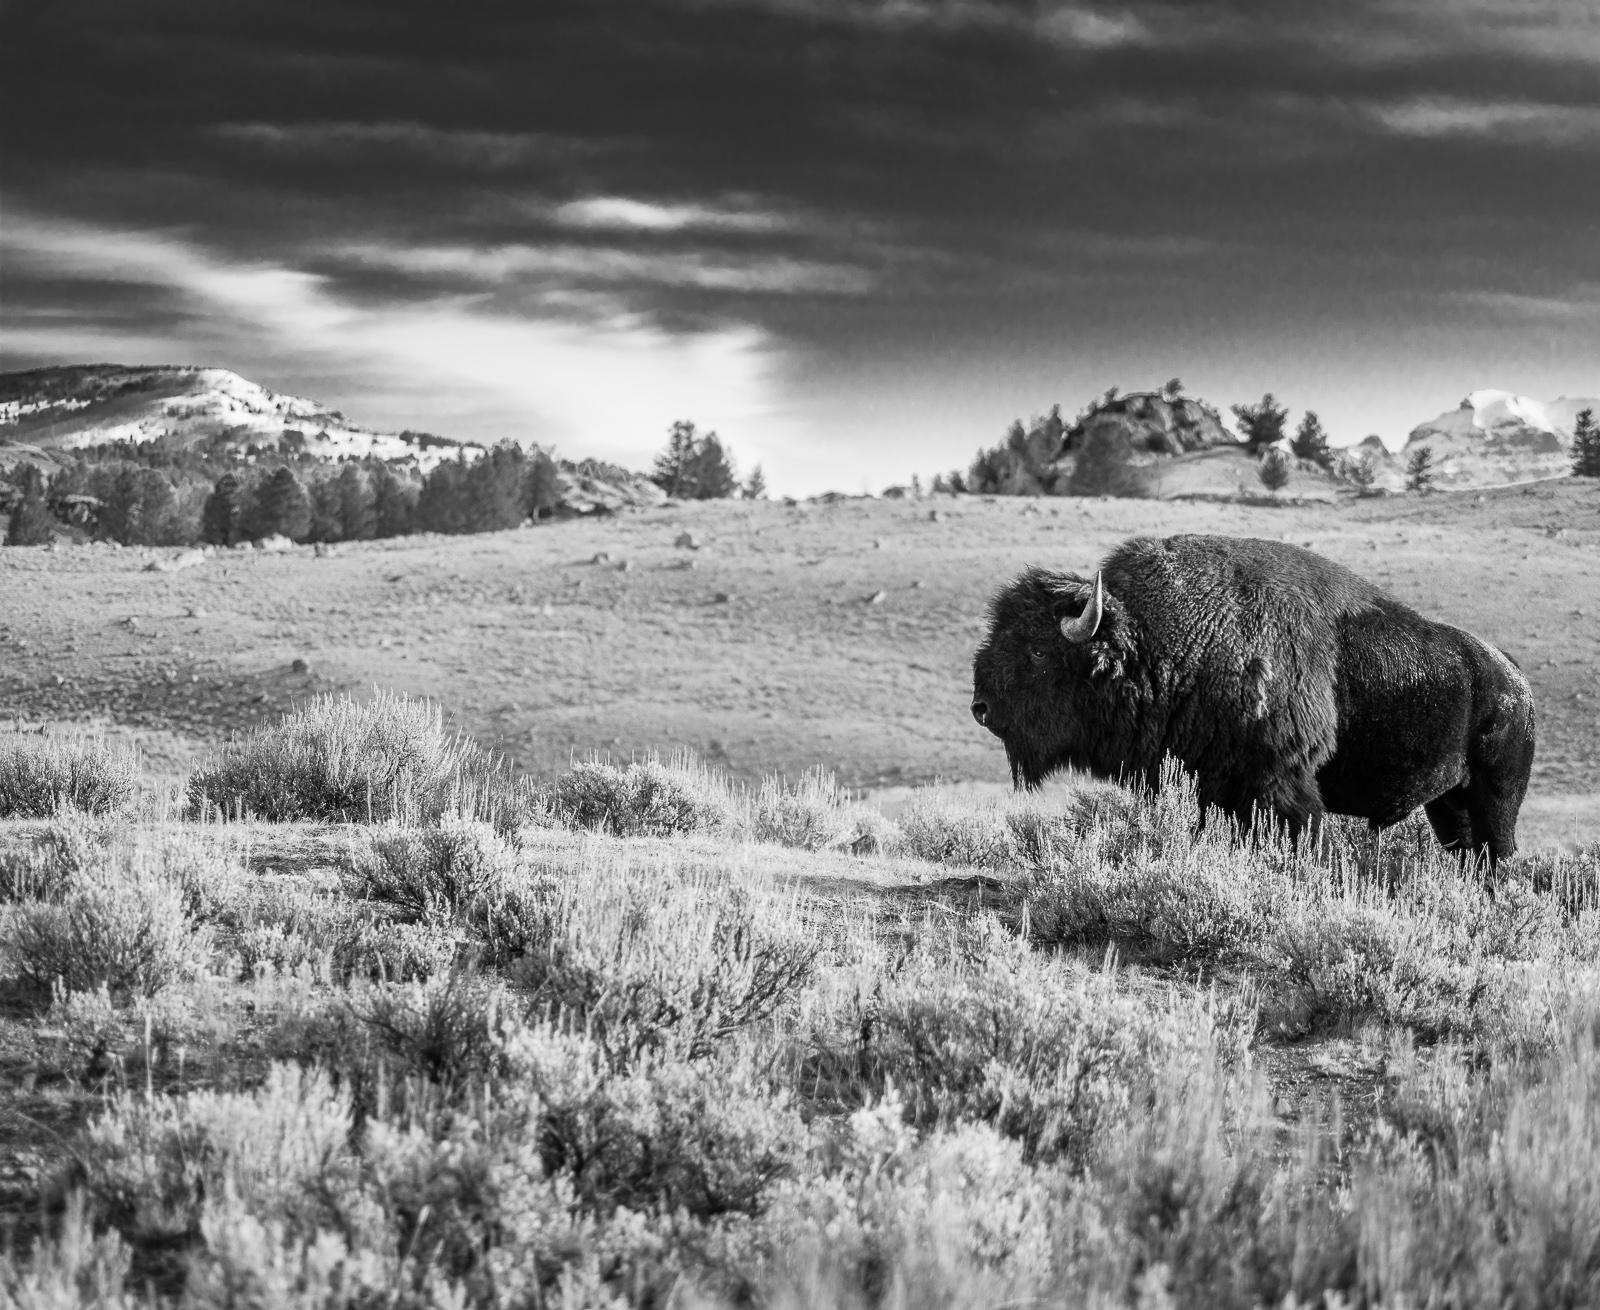 Classic Buffalo, Bison, Black and White, Yellowstone National Park, horizontal, Landscape, BW, B&W, Black, White, photo